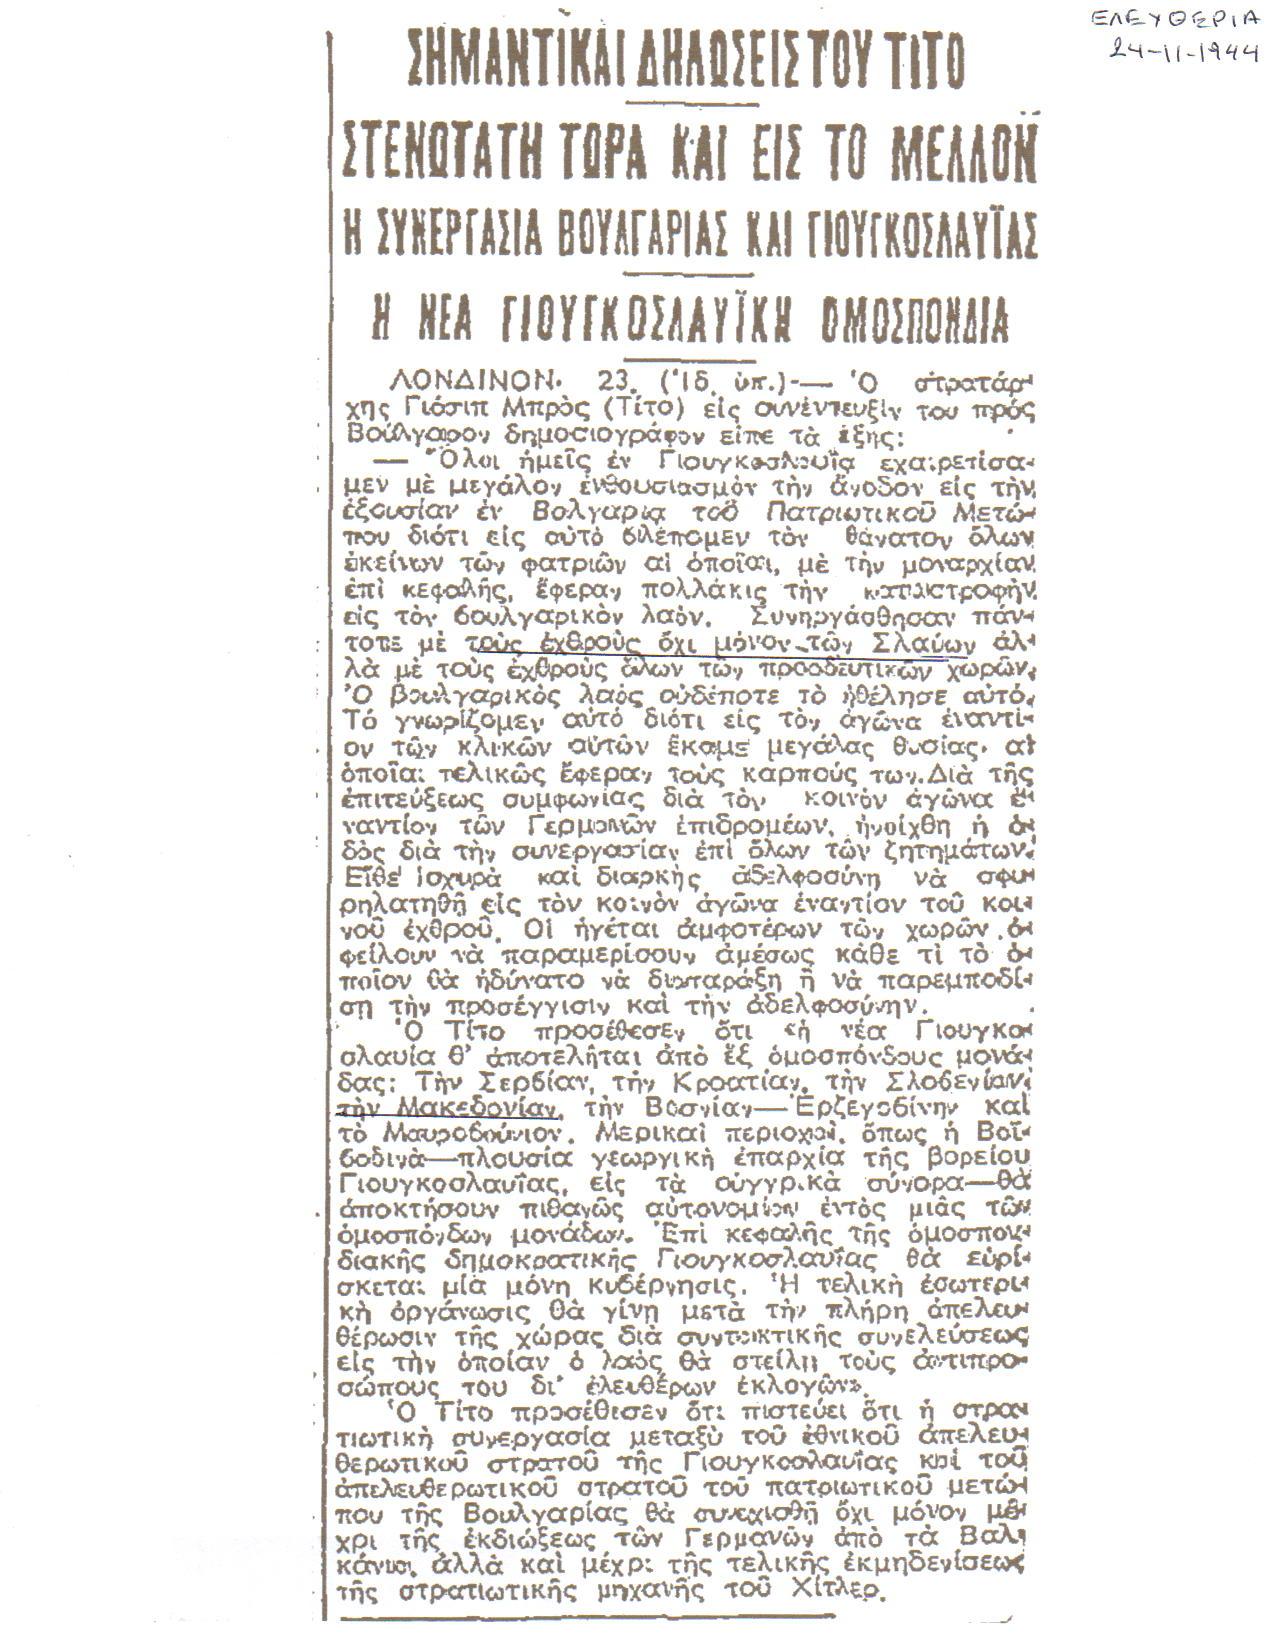 Email002 Ο Τίτο, οι Βούλγαροι και το Μακεδονικό μέσα από δημοσιεύματα της εποχής